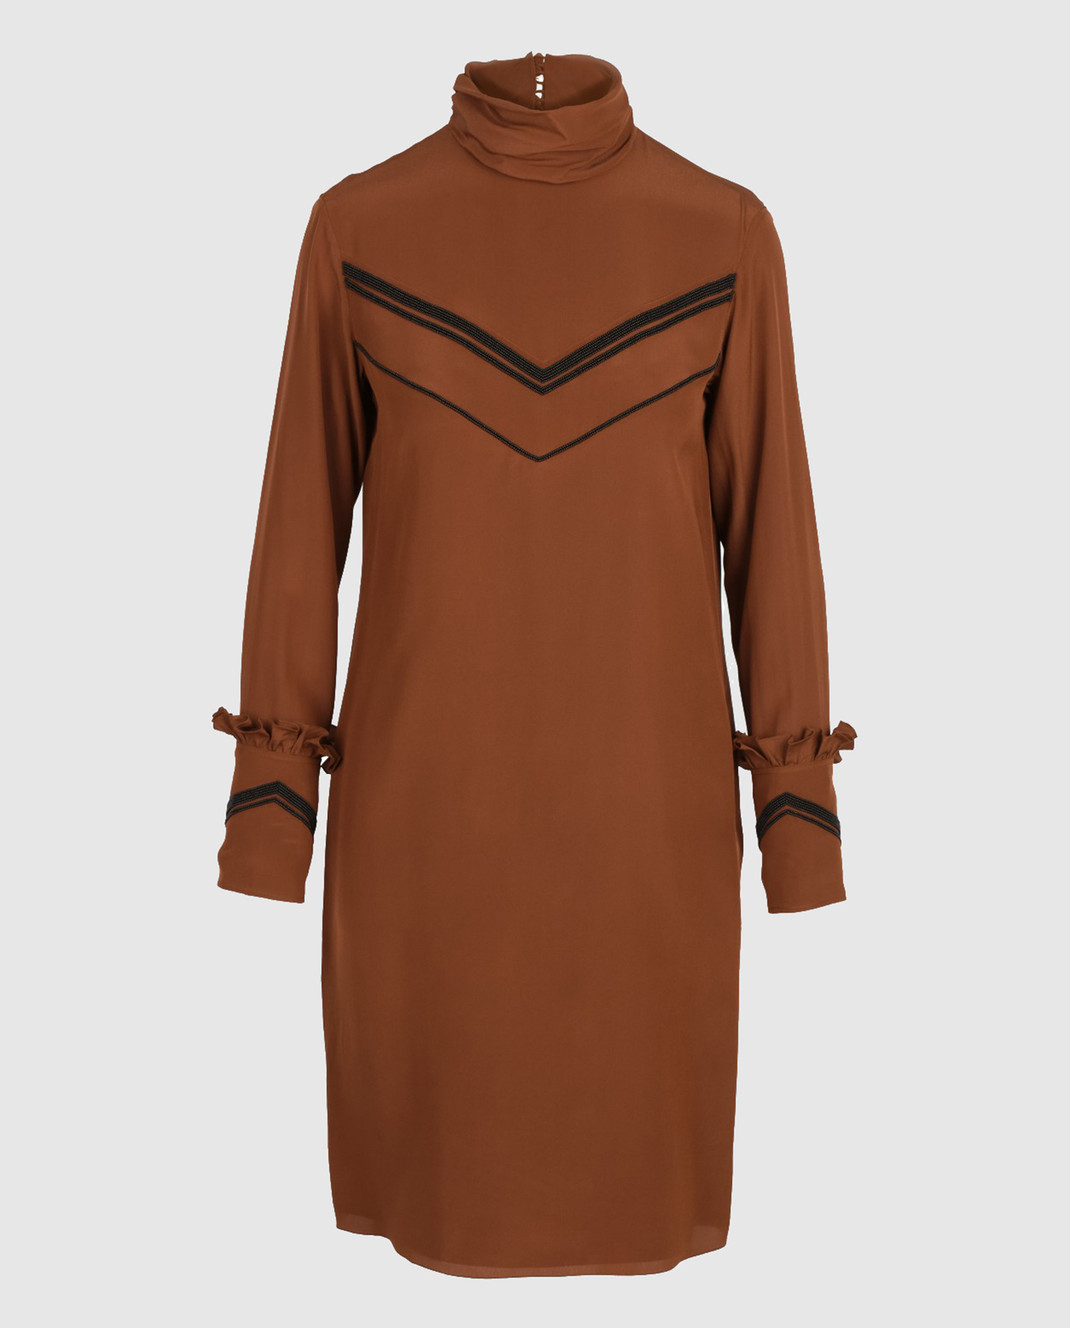 NINA RICCI Терракотовое платье из шелка 17PCRO040SE0801